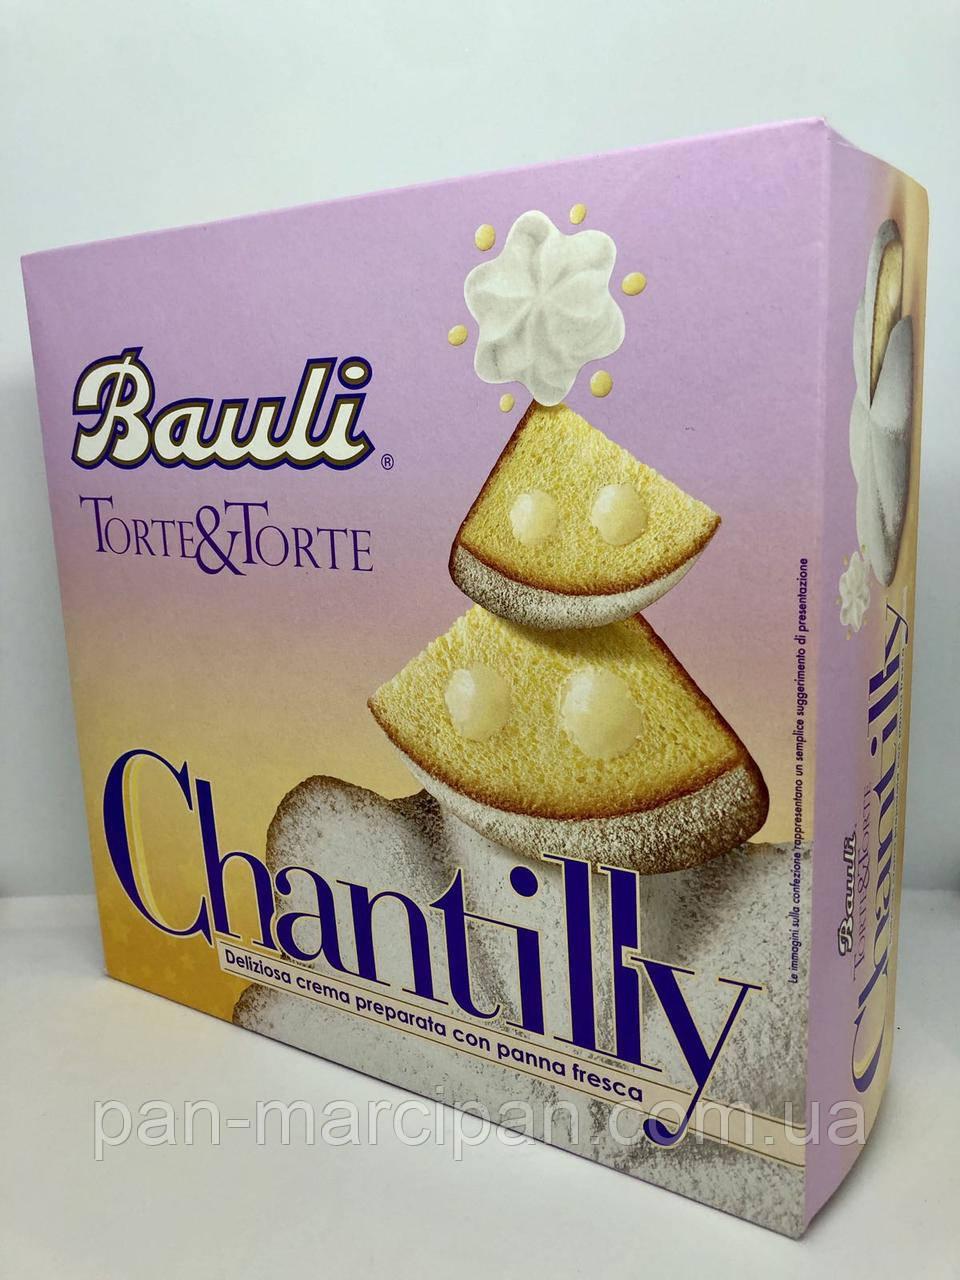 Torte&Torte Bauli Chantilly 375 г Італія